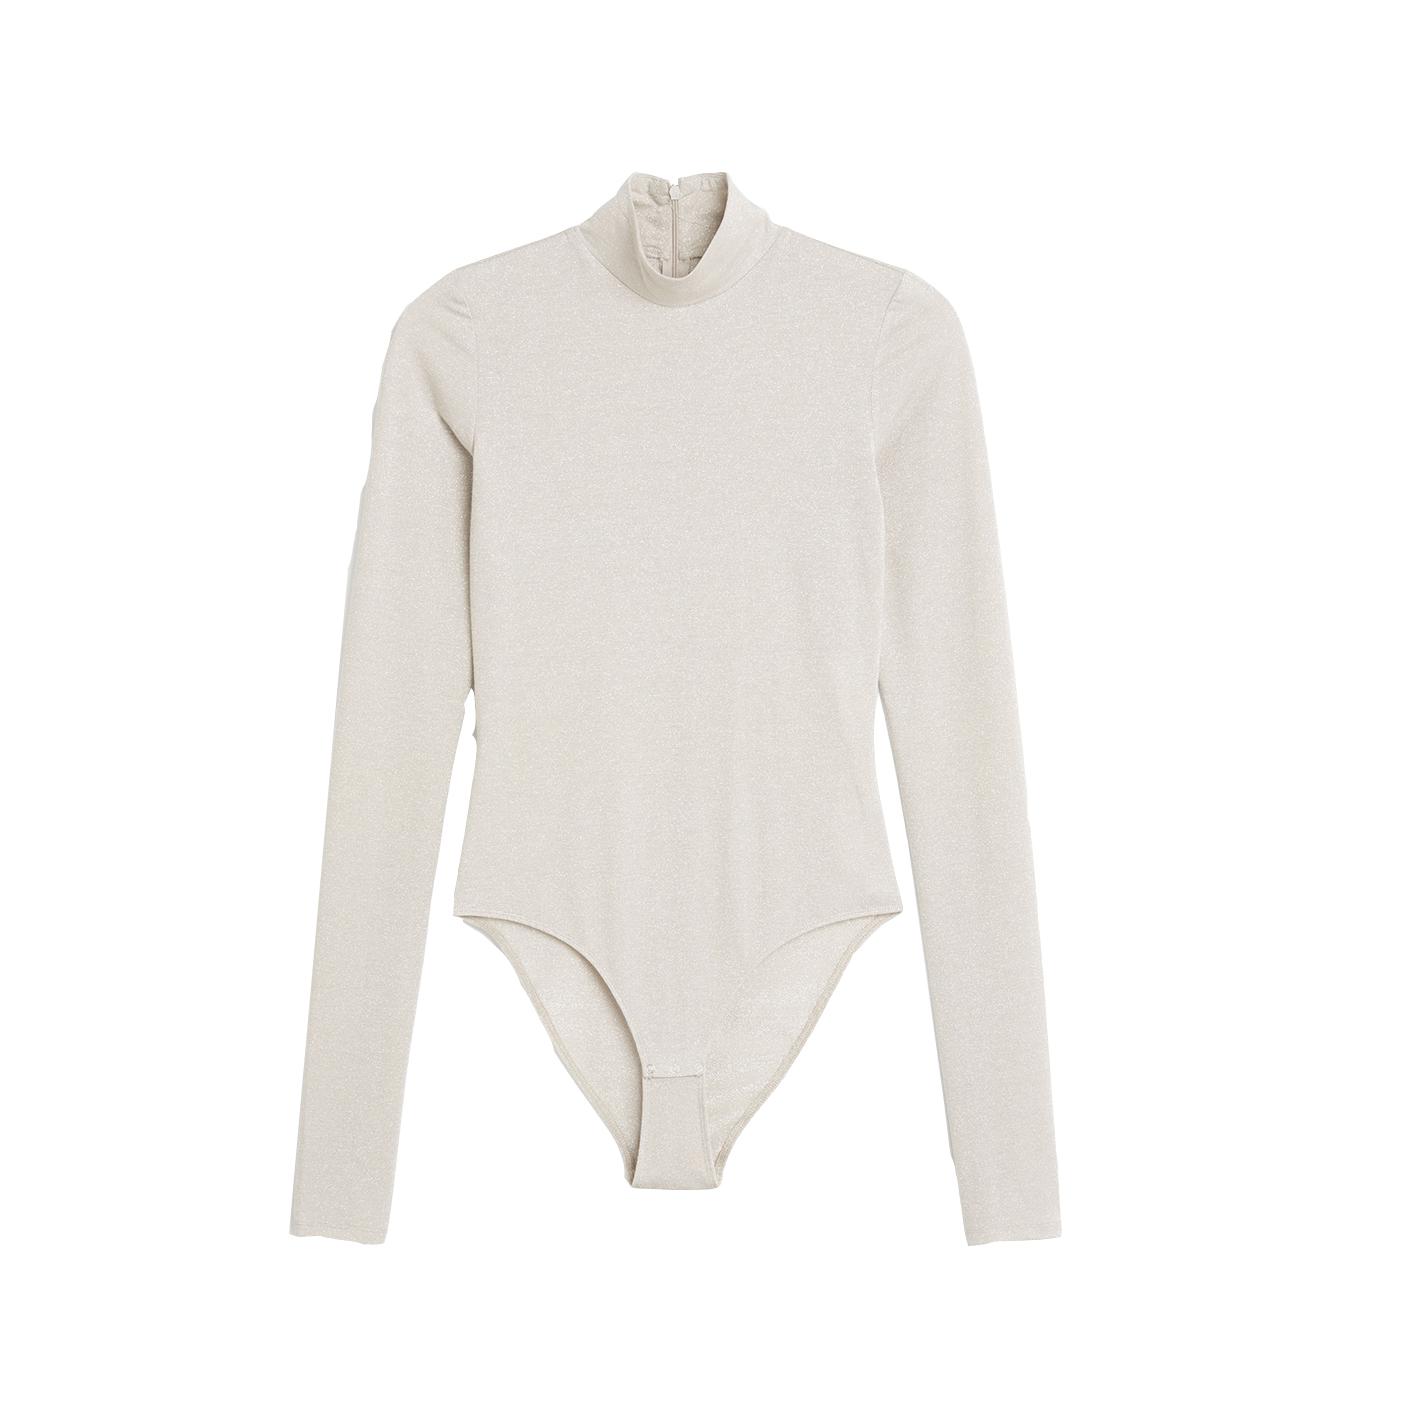 Limited Edition Glitter Bodysuit, £15, Monki